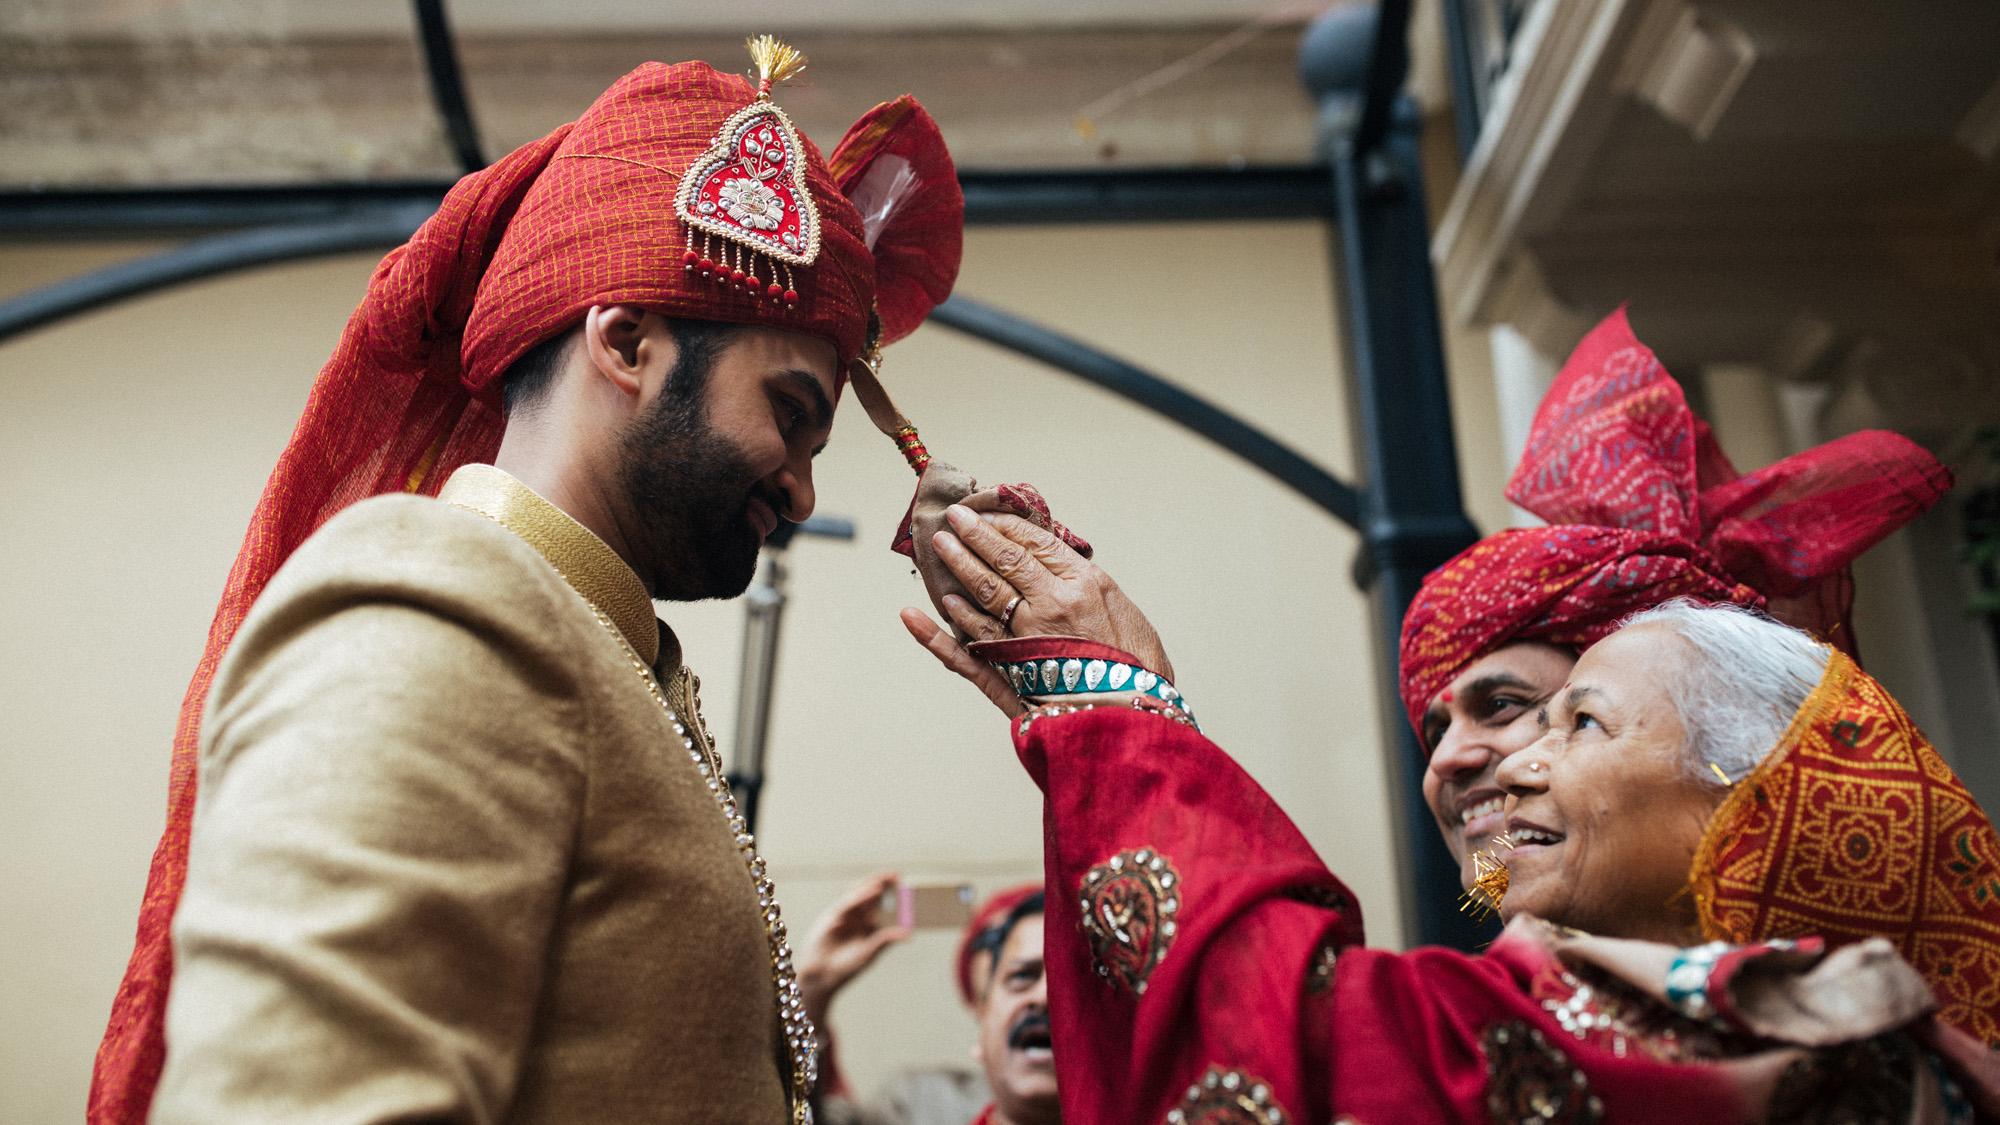 anu_maneesh_alec_vanderboom_Indian_wedding_photography-0080.jpg